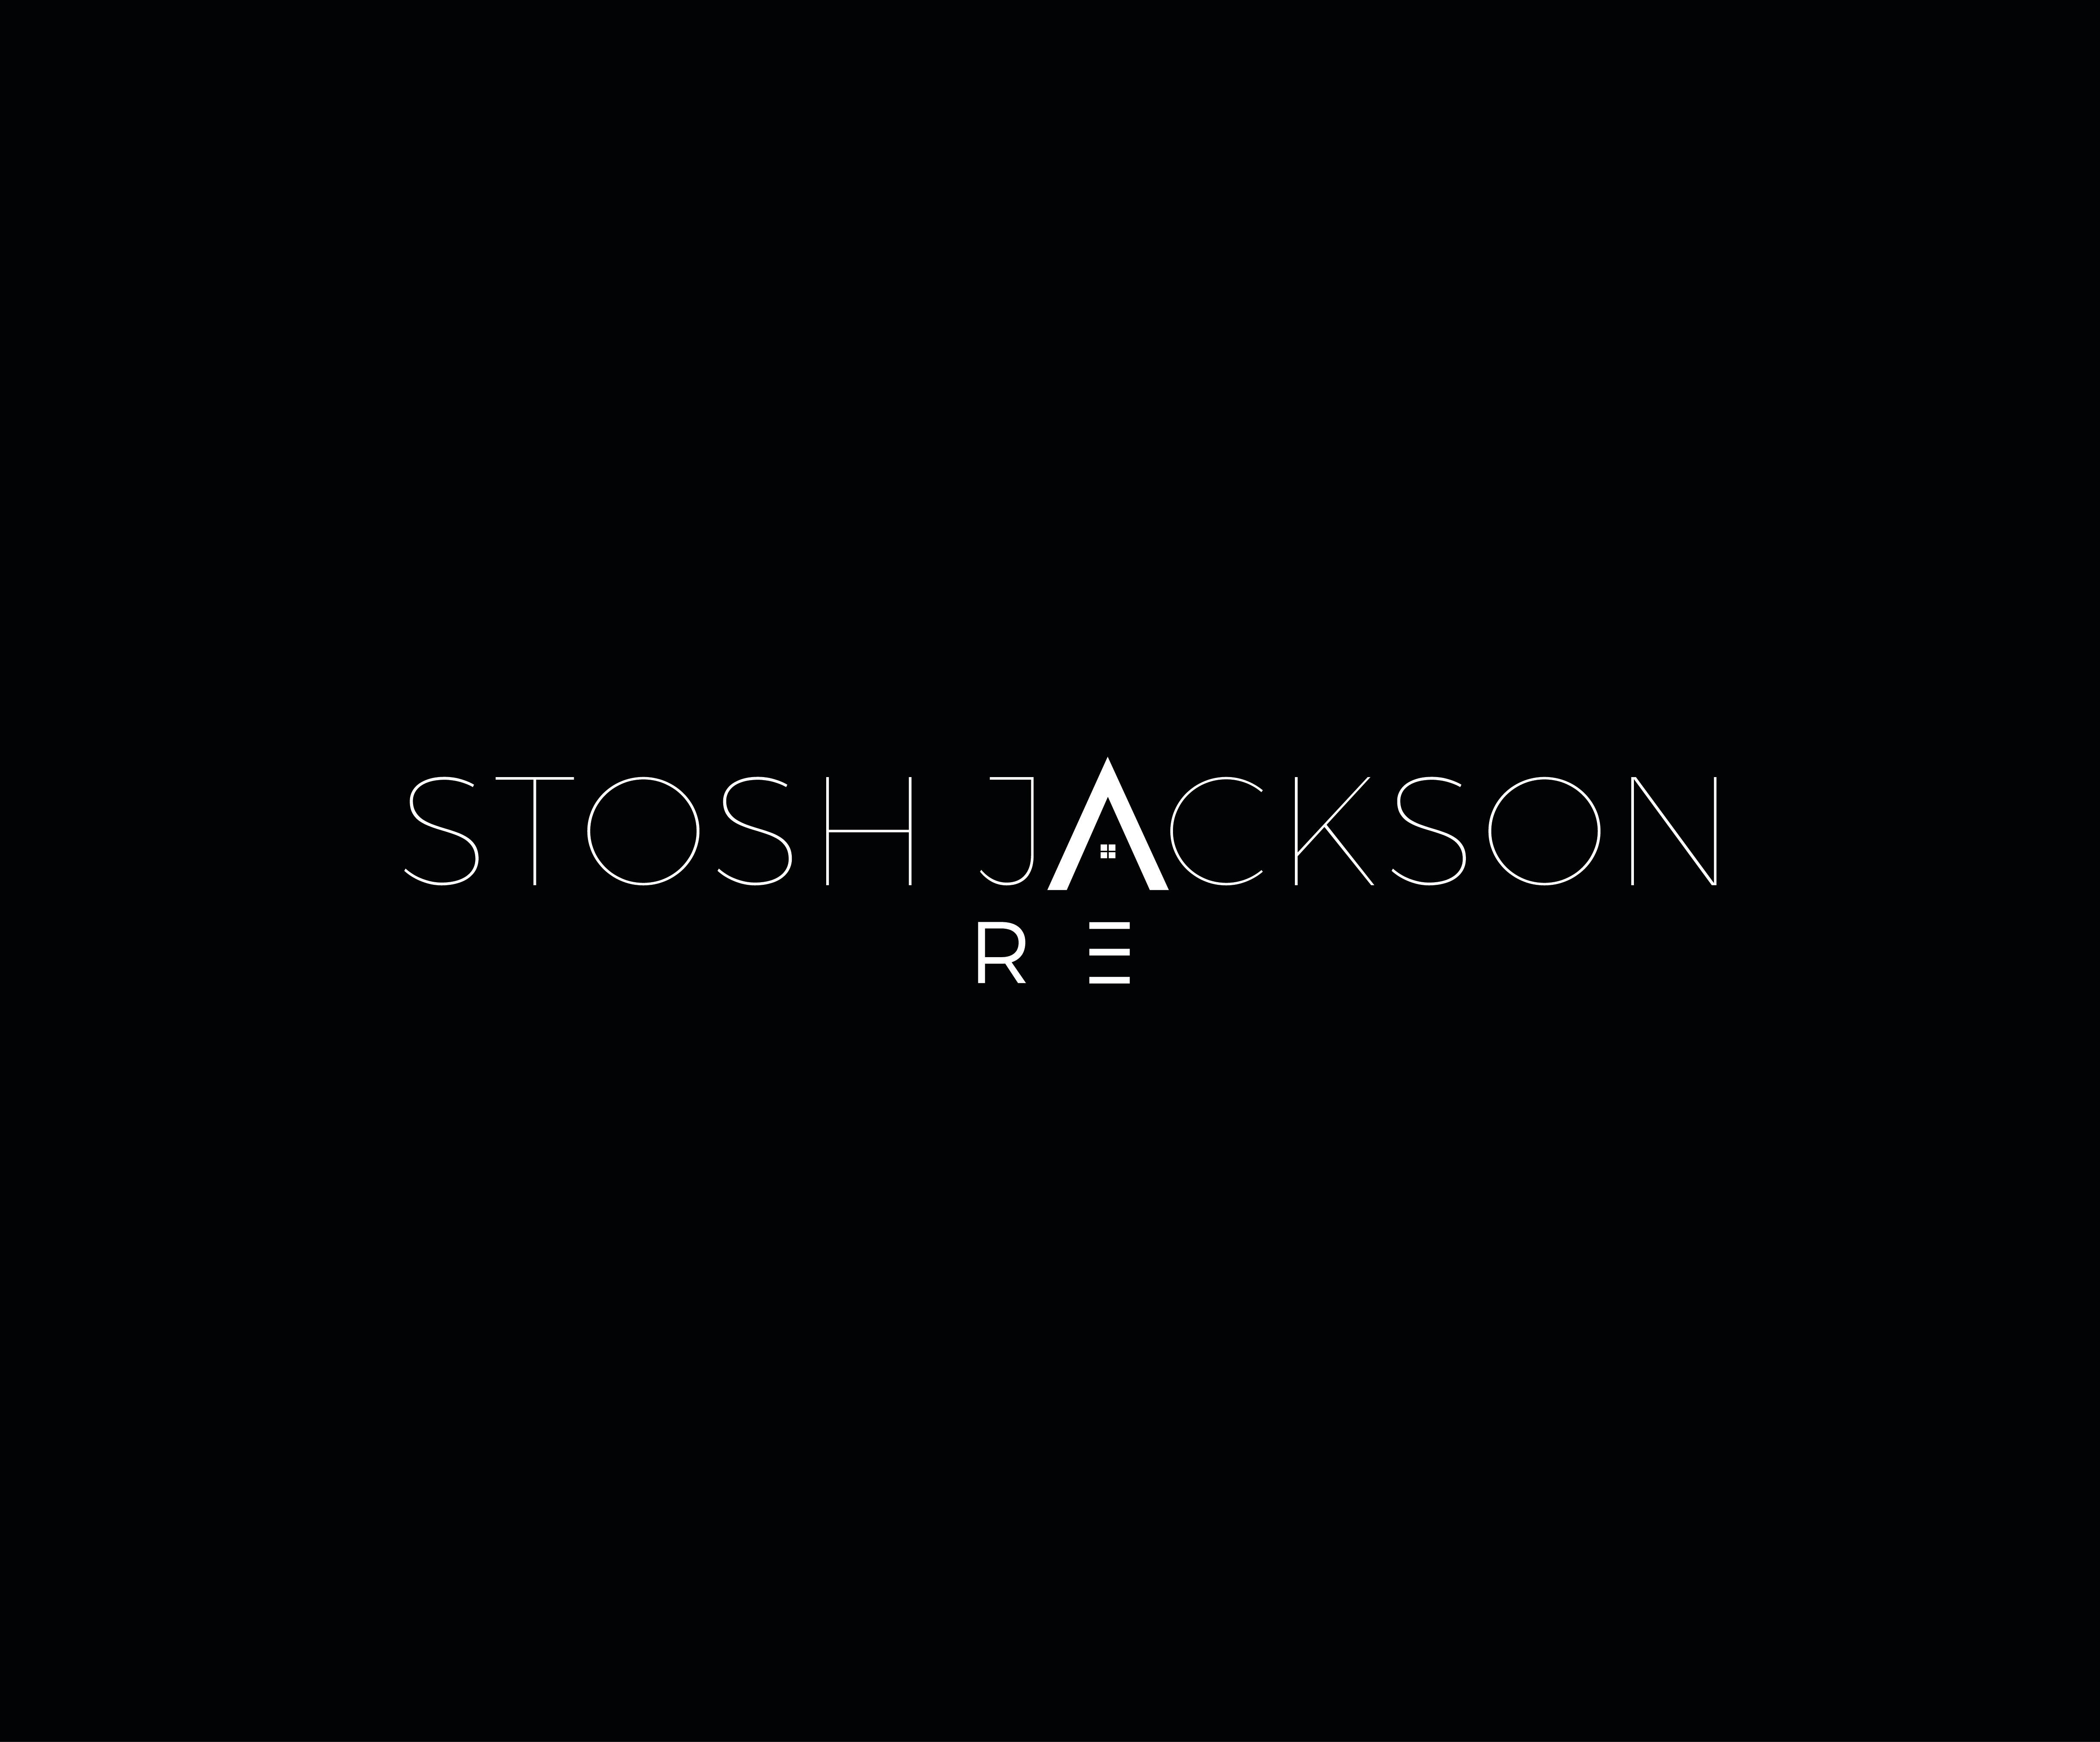 stosh jackson  logo ai format-REthin